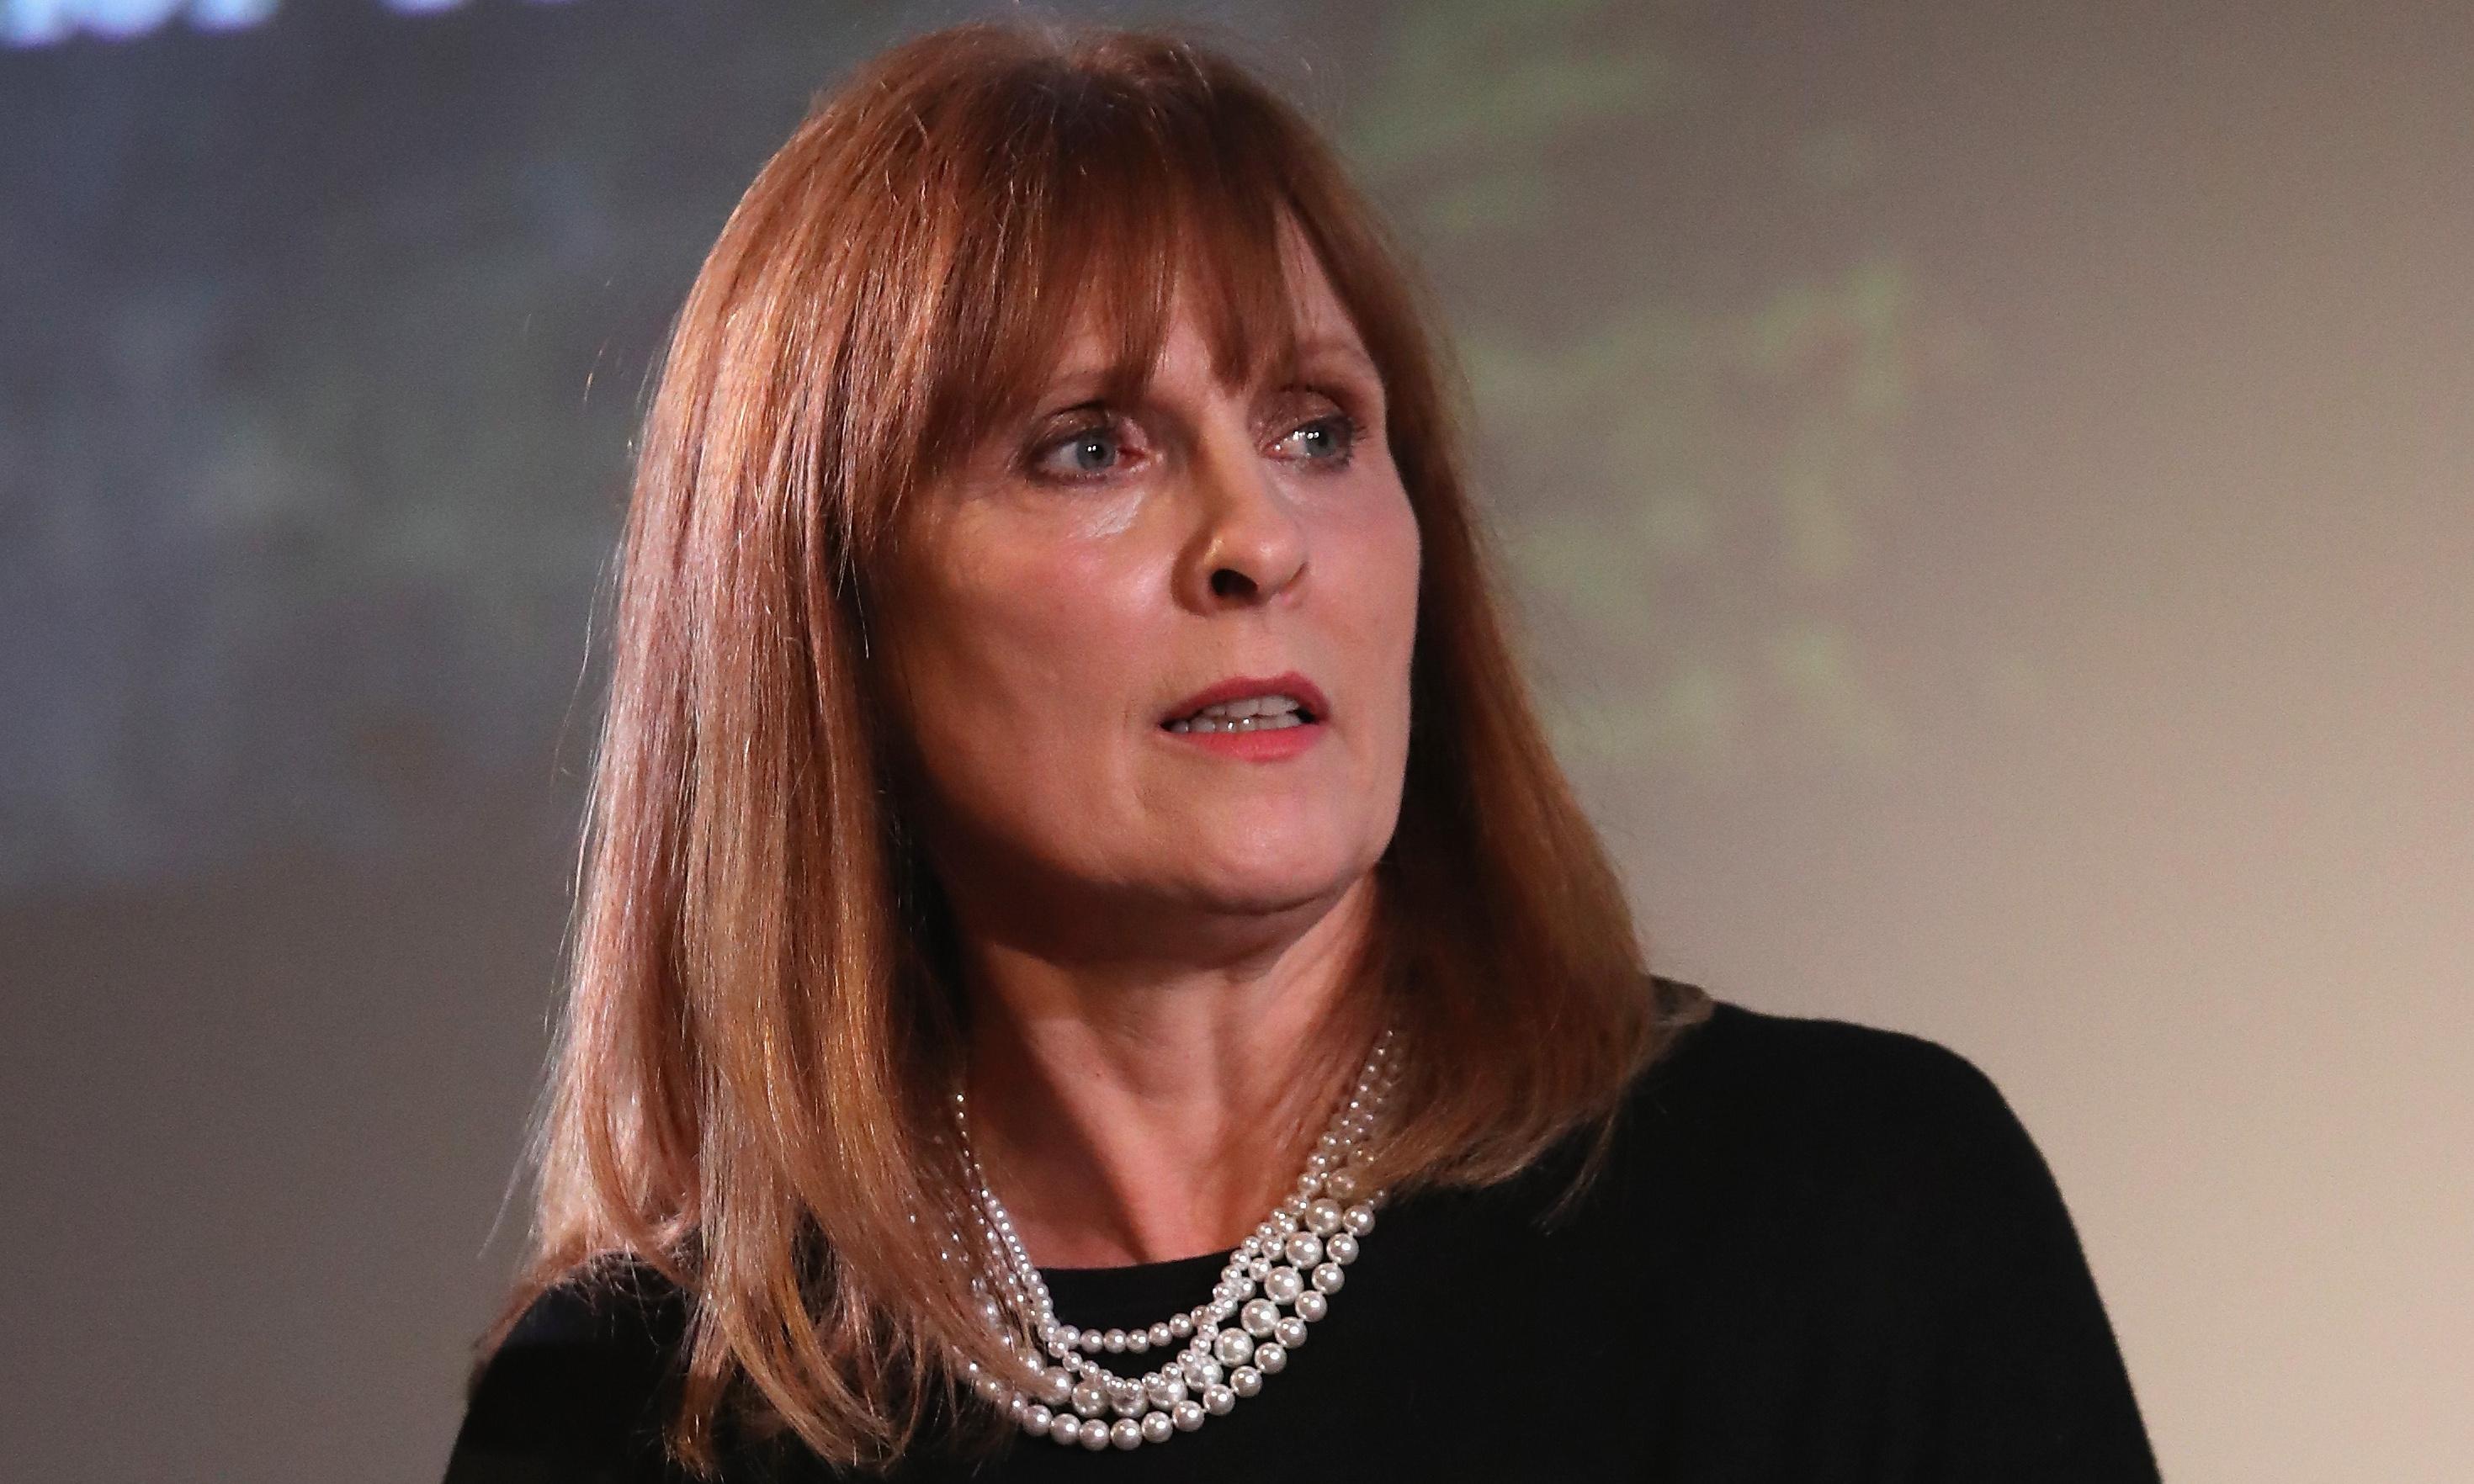 Debbie Horsfield says postnatal depression helped her write Poldark